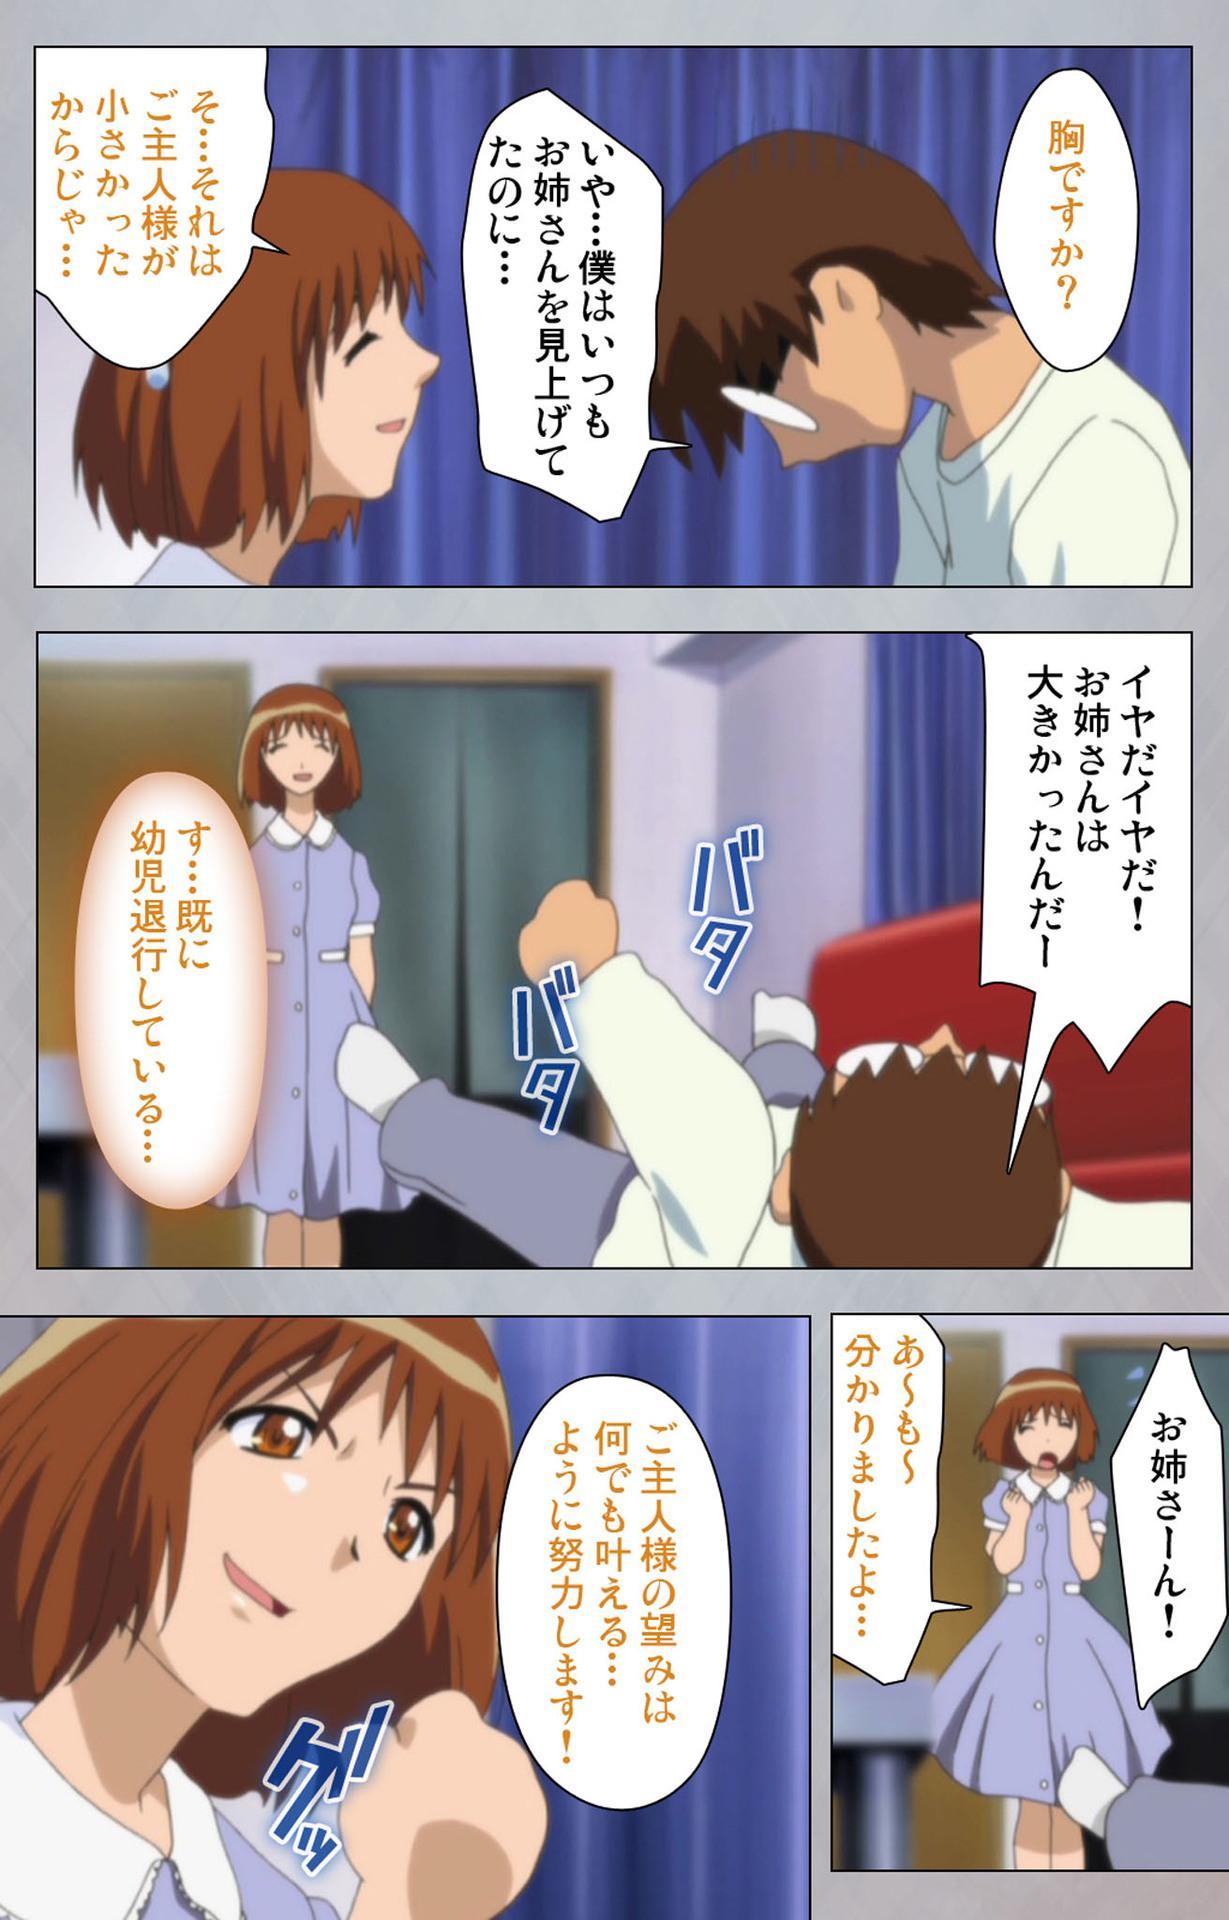 [Digital Works] [Full Color Seijin Ban] Sex Android ~Risou no Onna de Nuite yaru~ Kanzenban 74